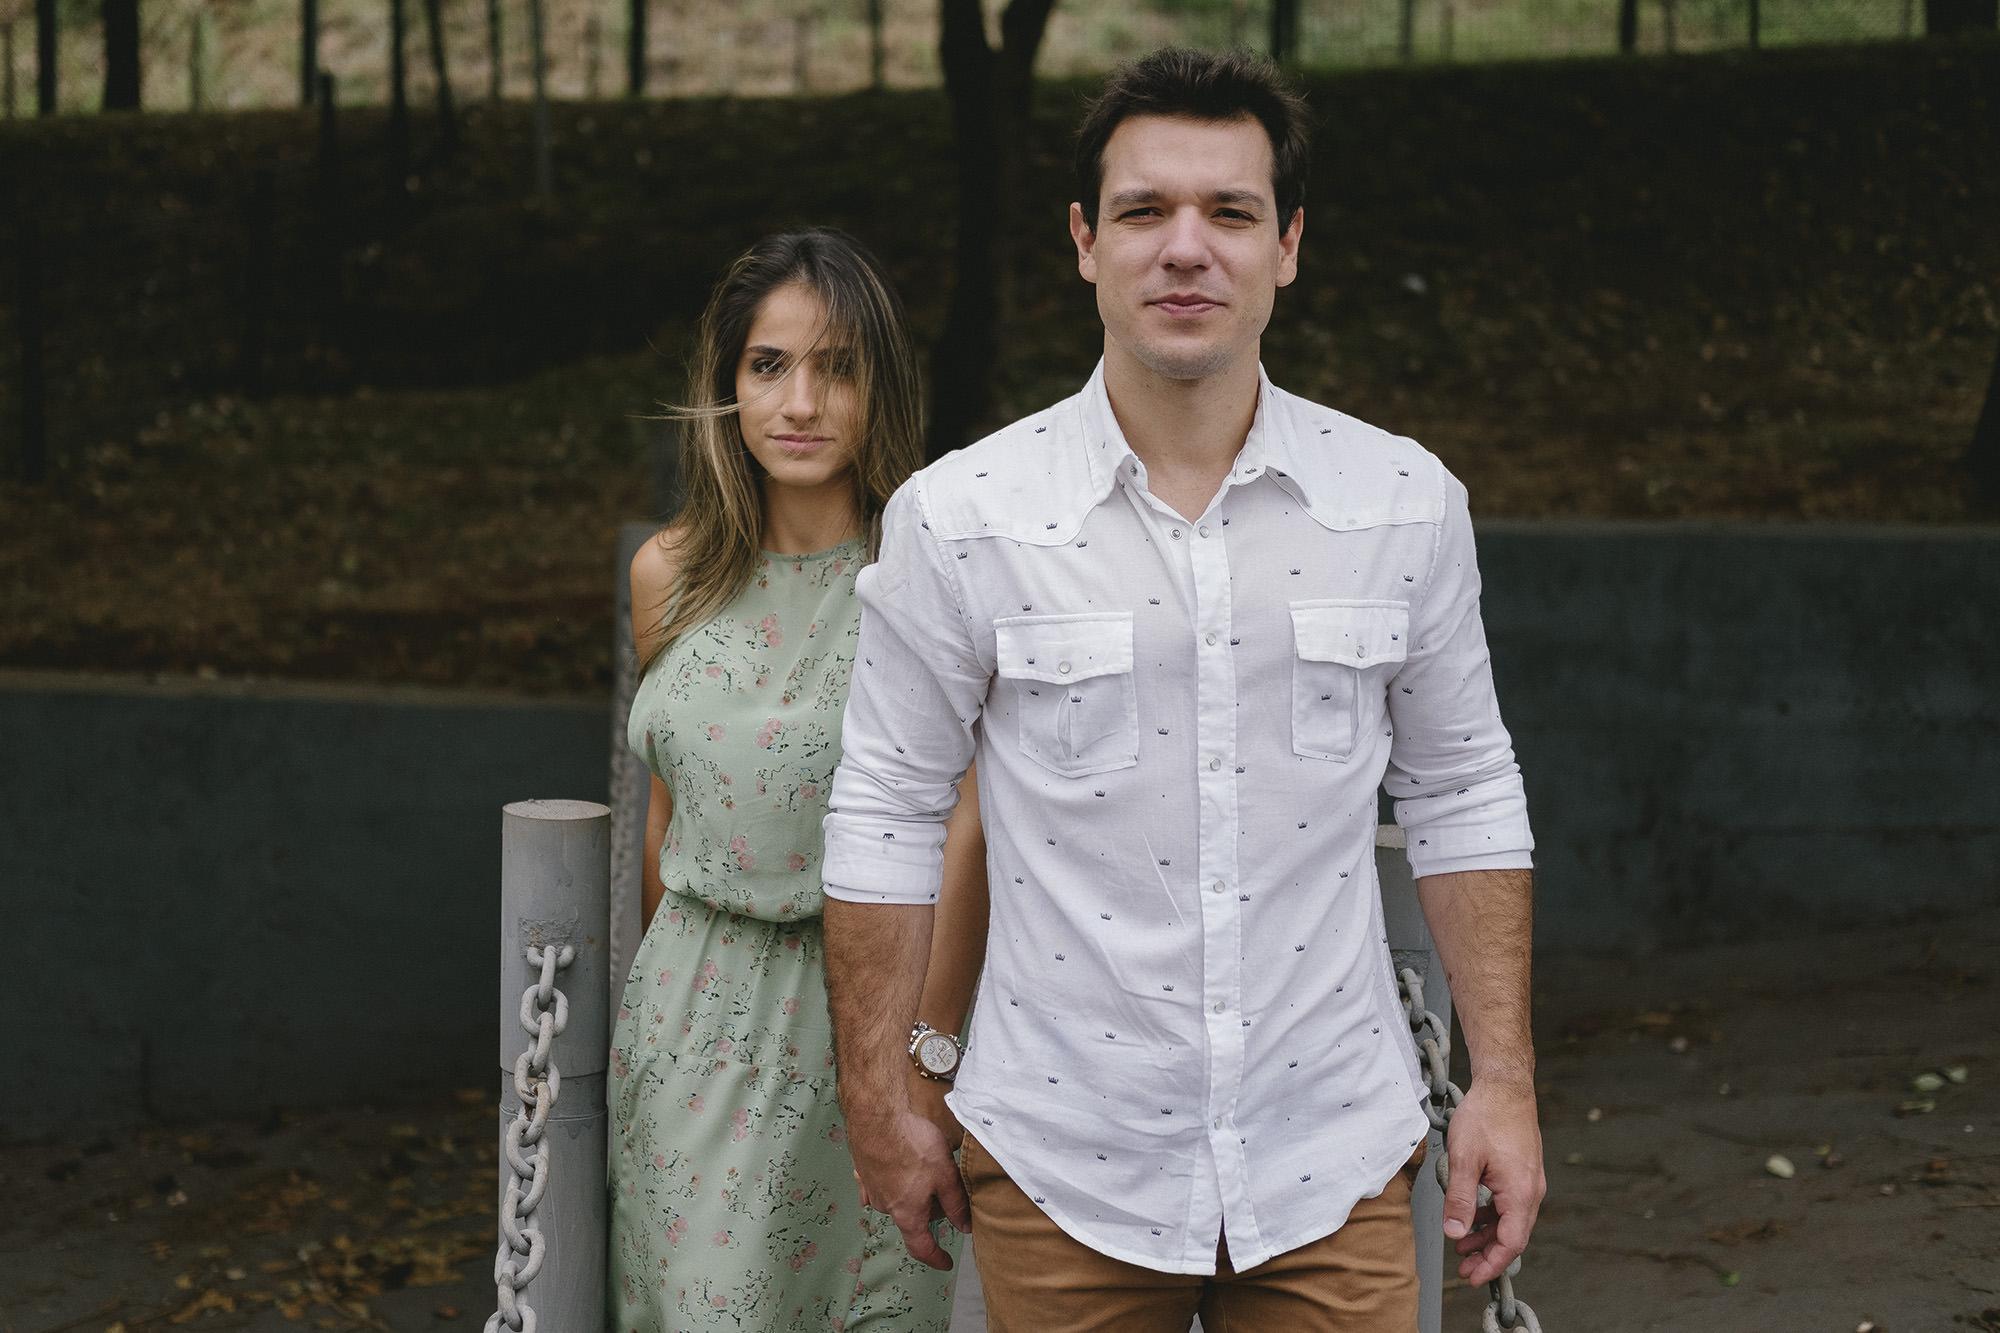 Laura e Rodrigo - Gustavo Semeghini - Ensaio - 06.jpg